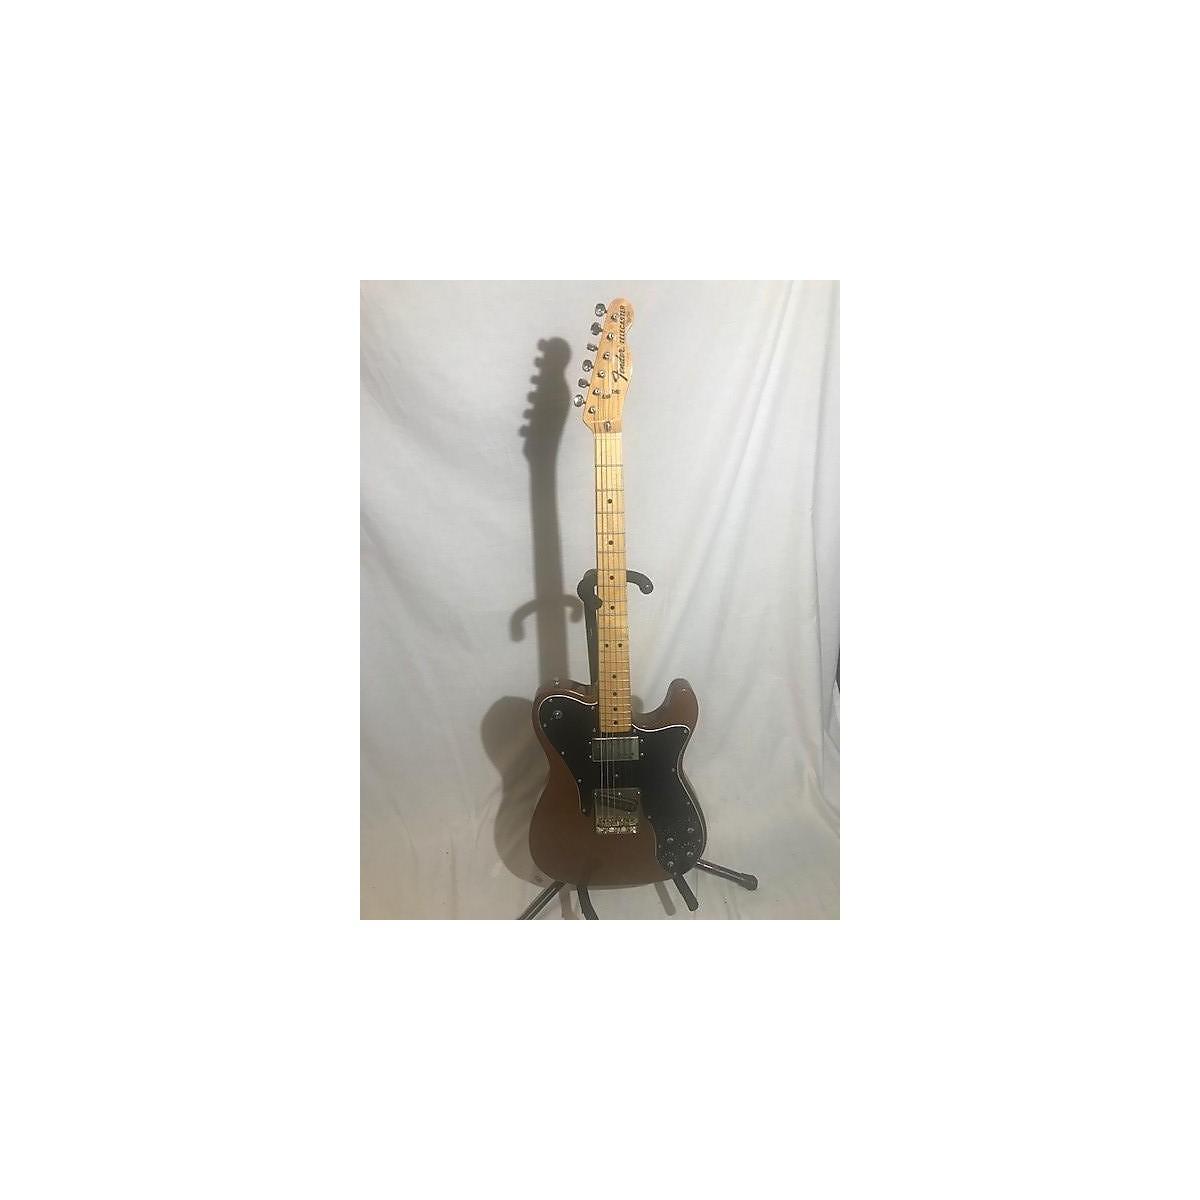 Fender 1973 Telecaster Custom Solid Body Electric Guitar